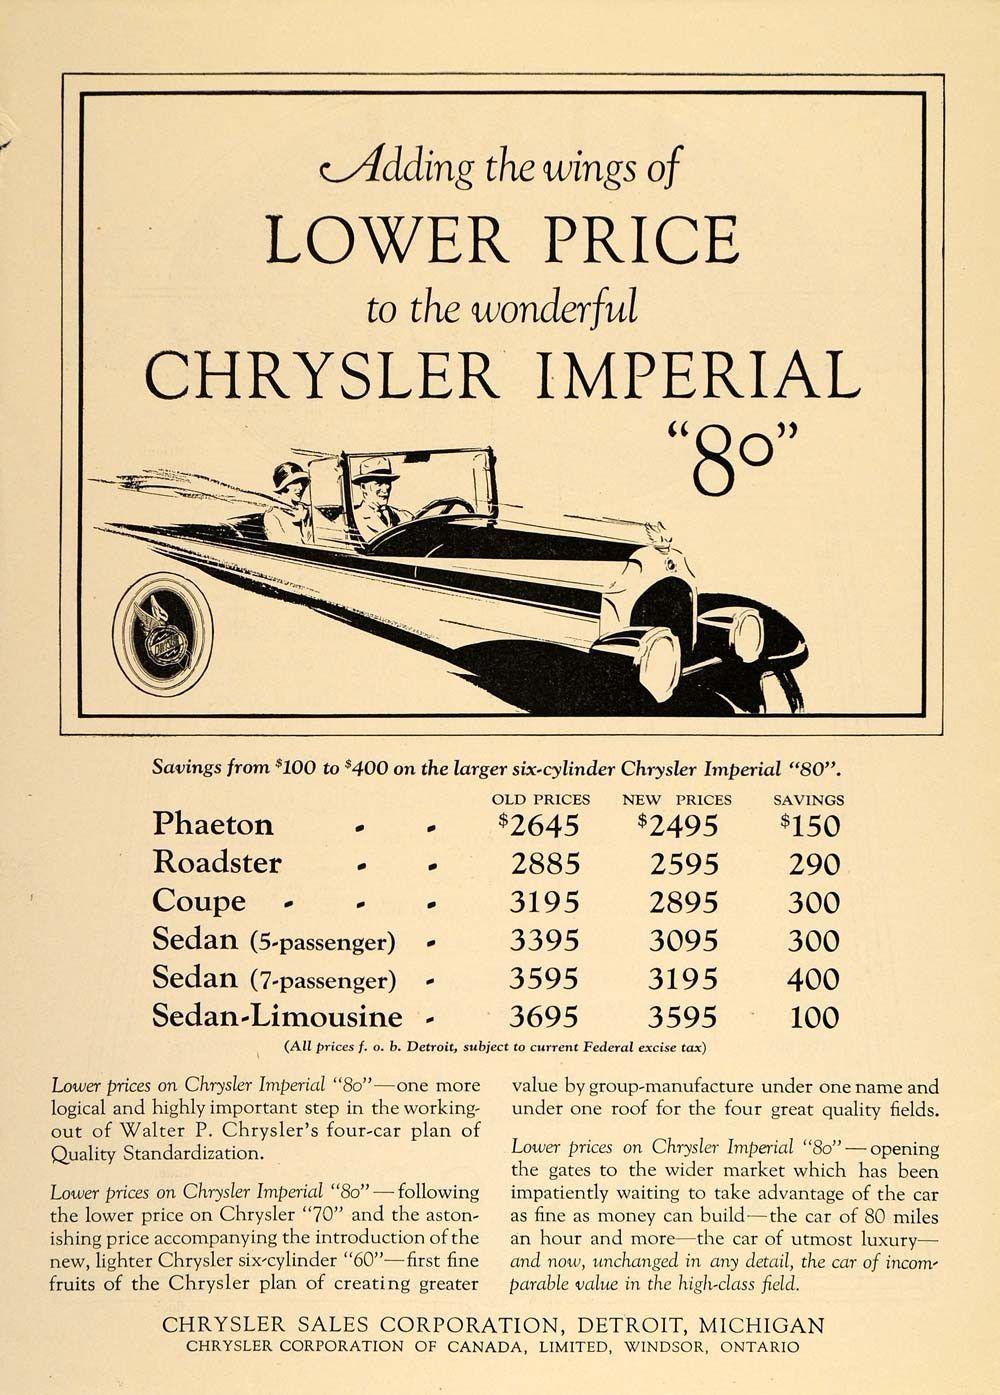 1926 Vintage Ad Chrysler Imperial 80 Auto Car Prices - ORIGINAL ...